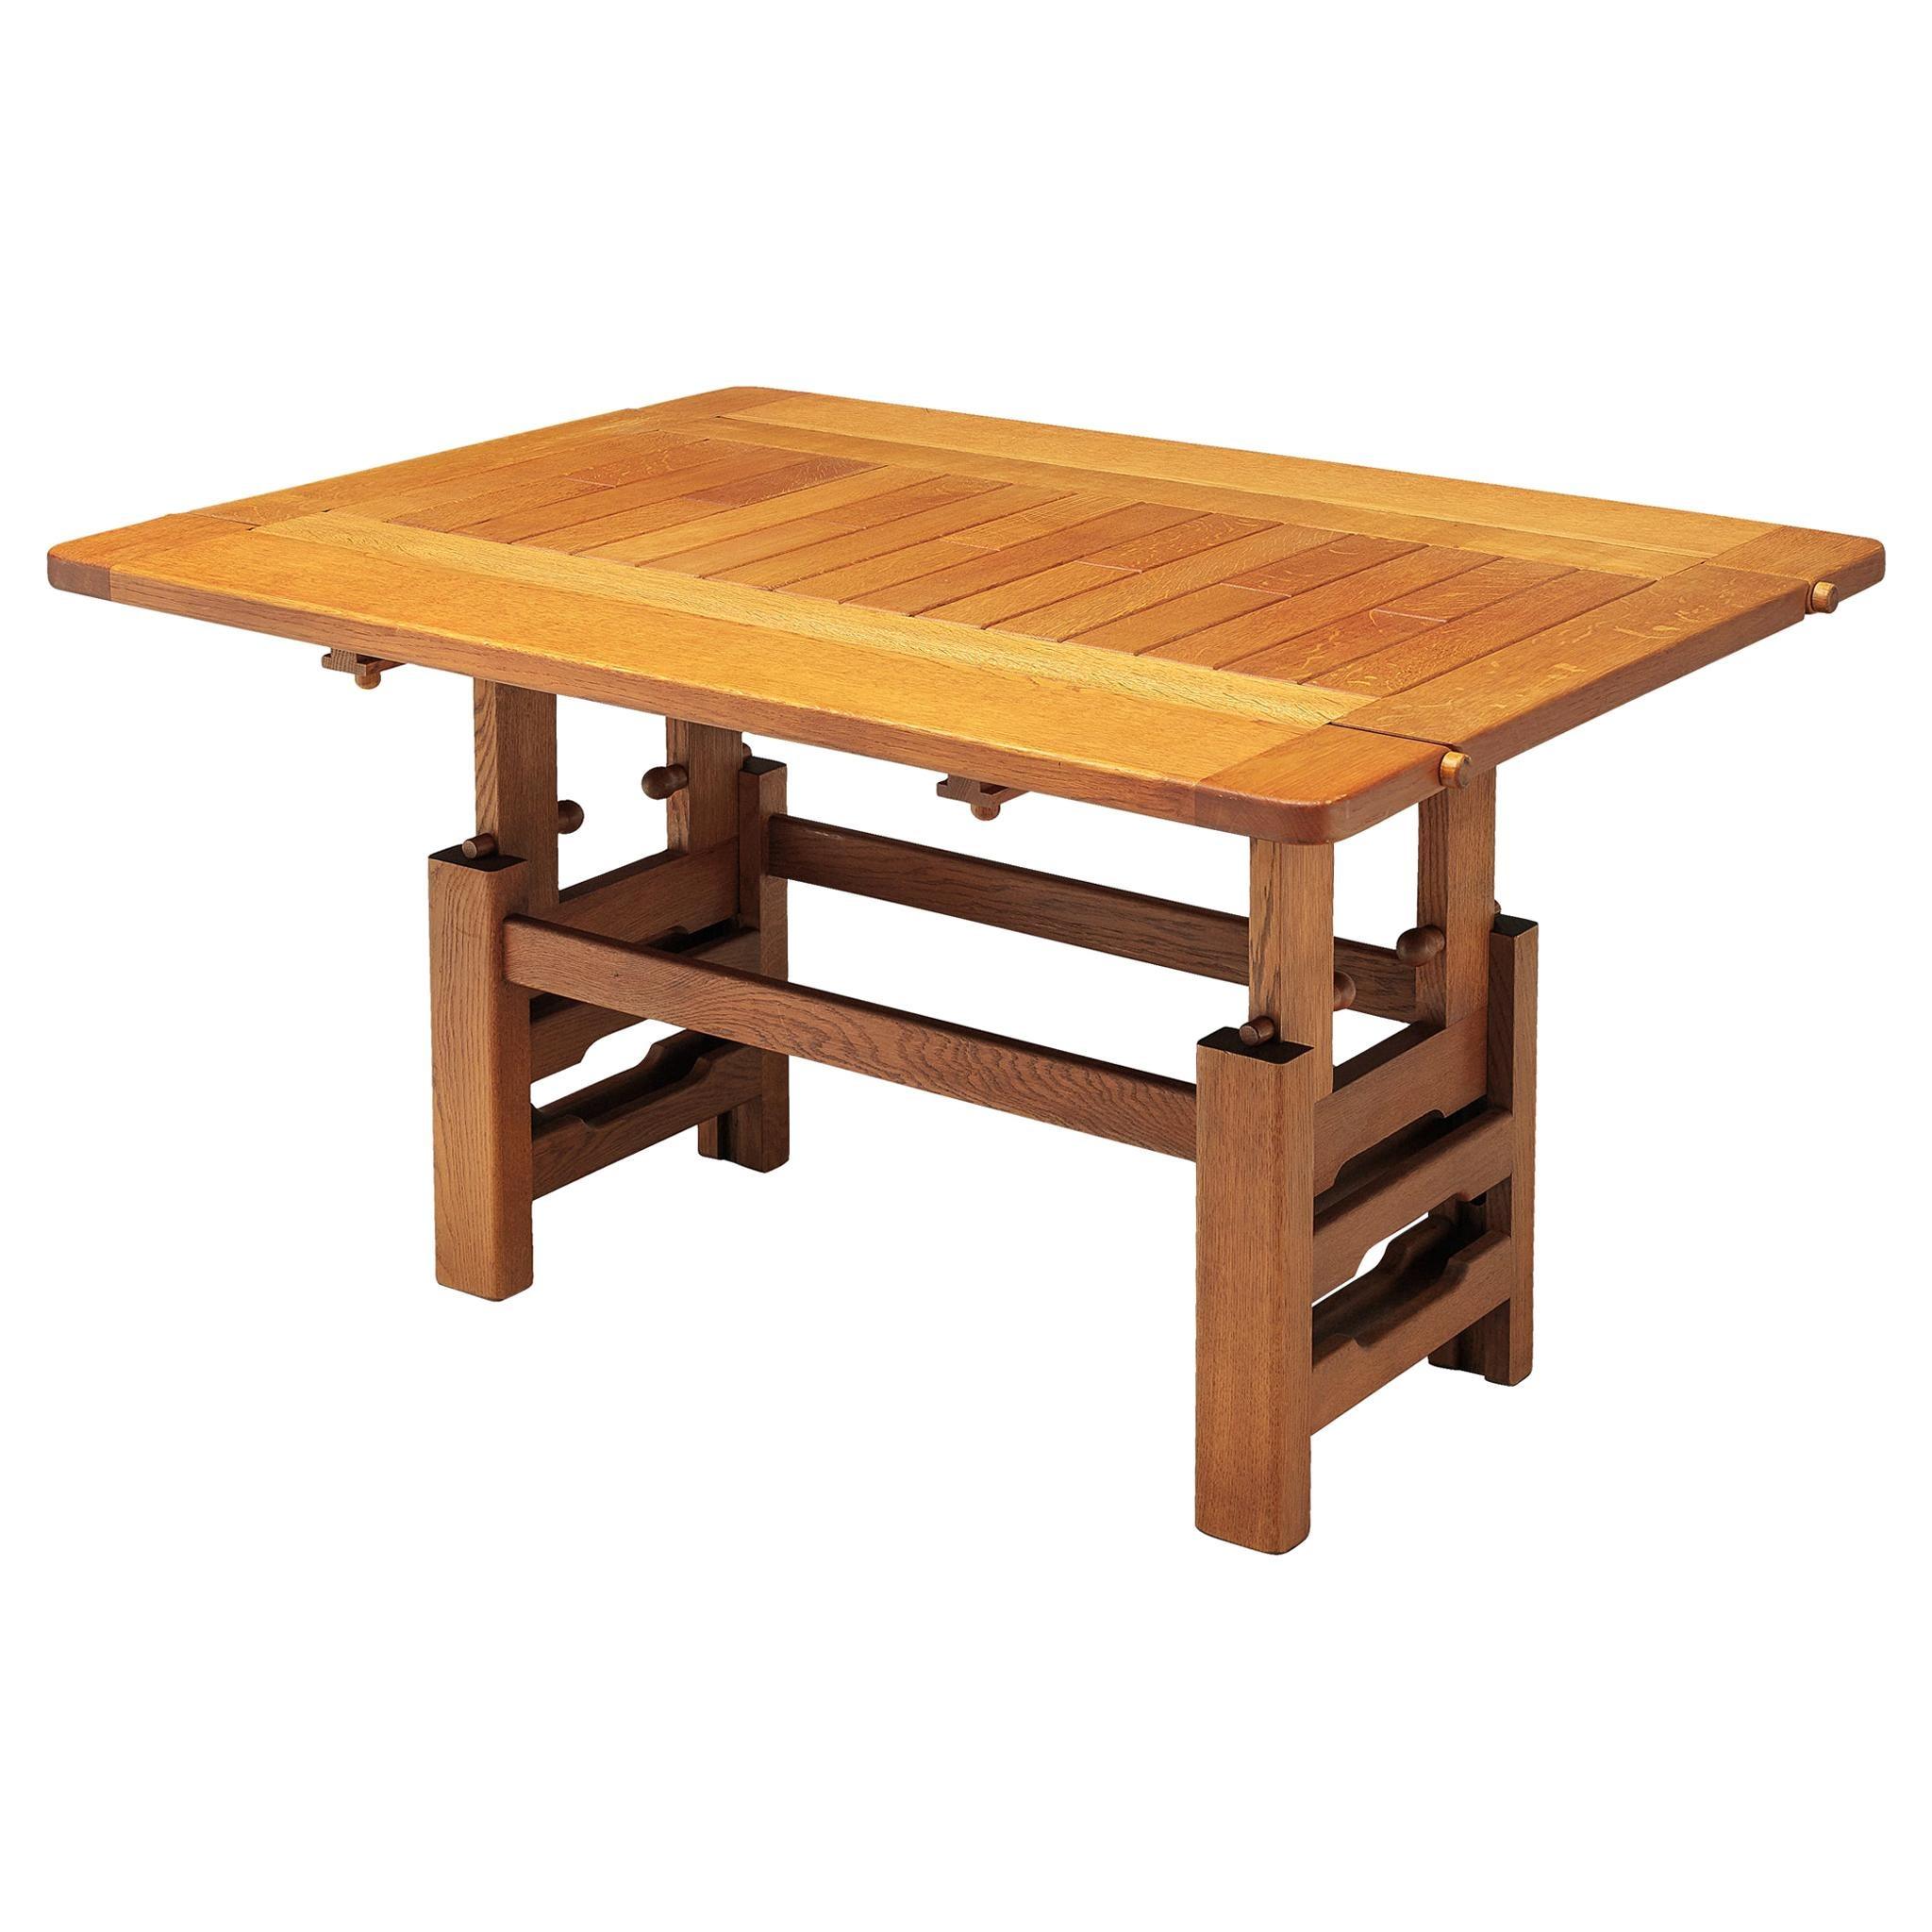 Guillerme et Chambron Adjustable Table in Oak